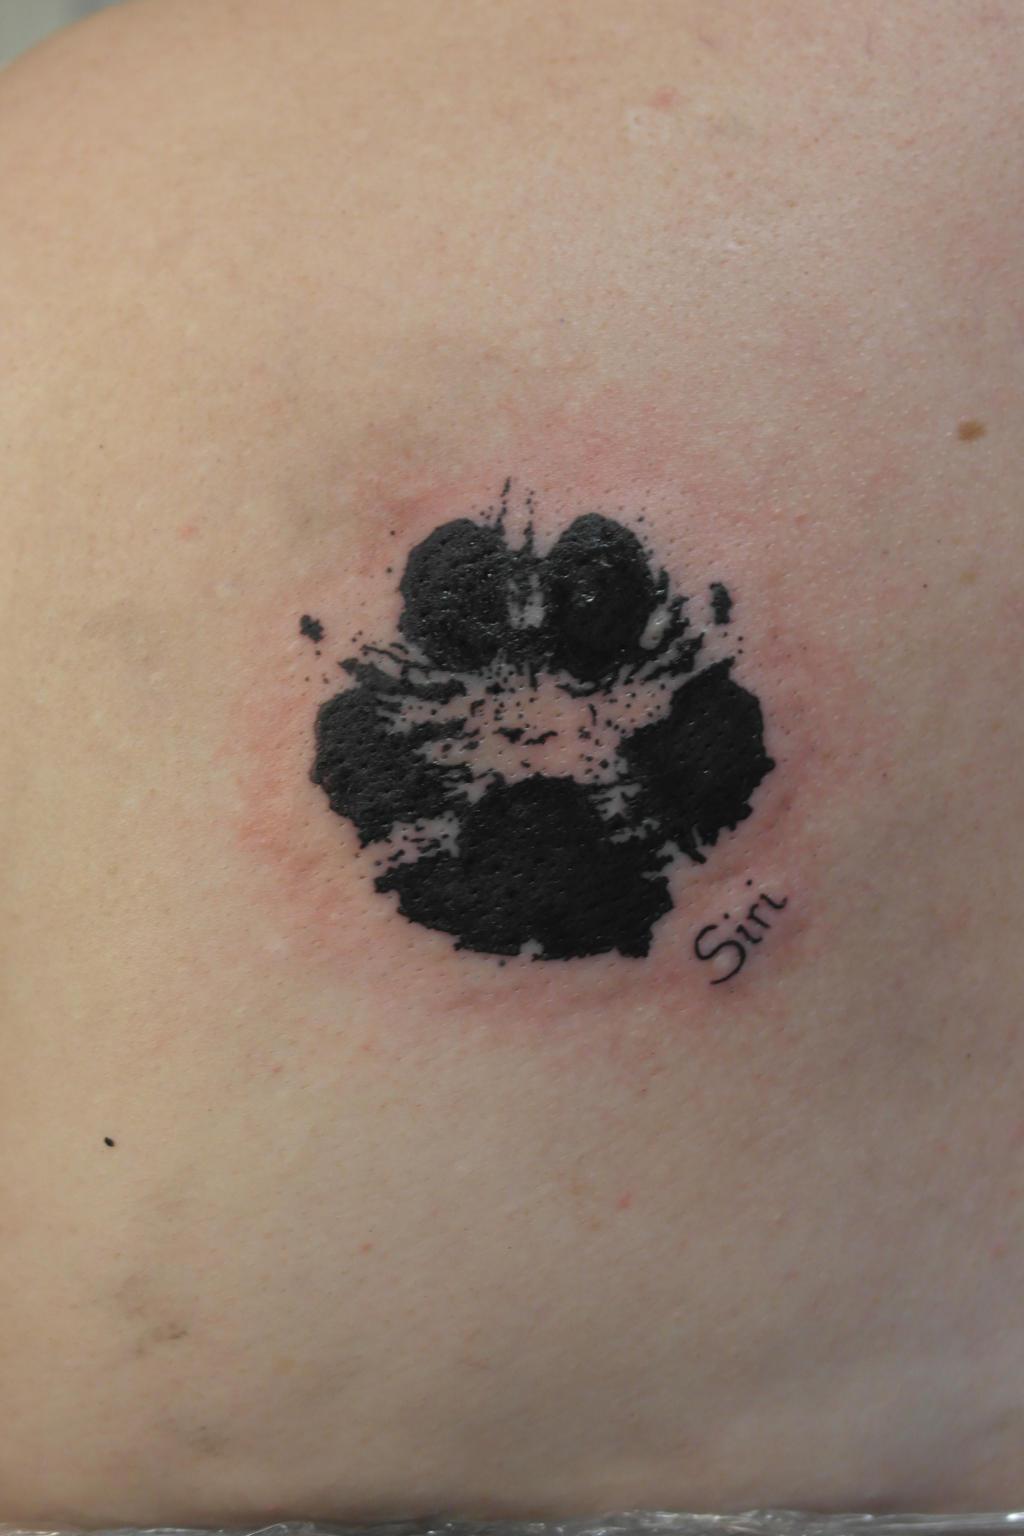 Dog paw tattoo by arthousegrafika on deviantart for Dog paw print tattoo